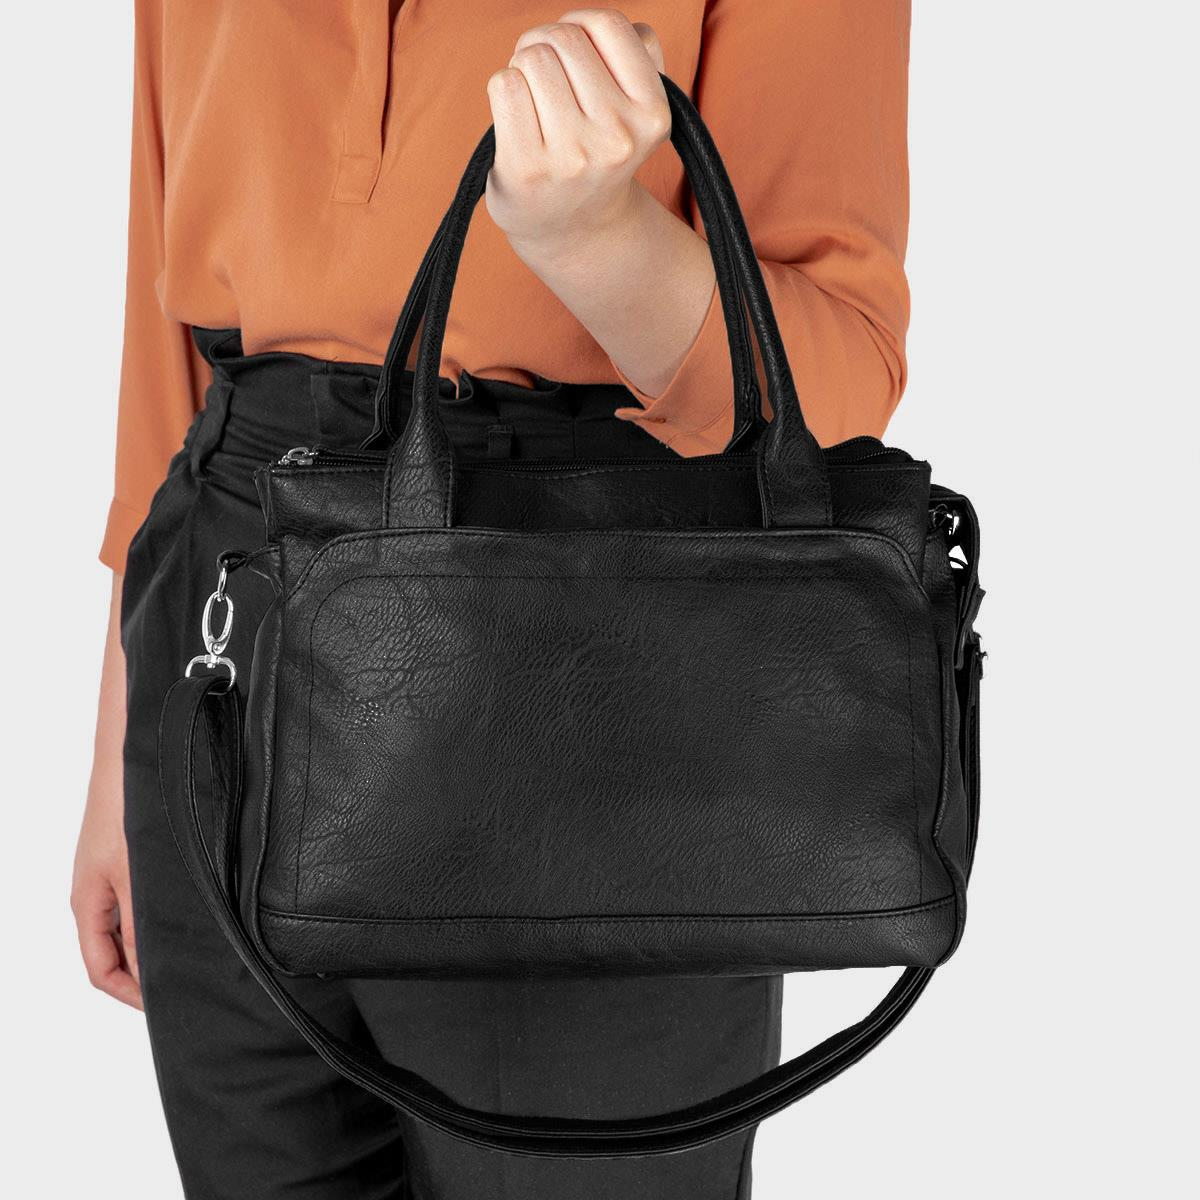 Black Textured Handbag with Strap